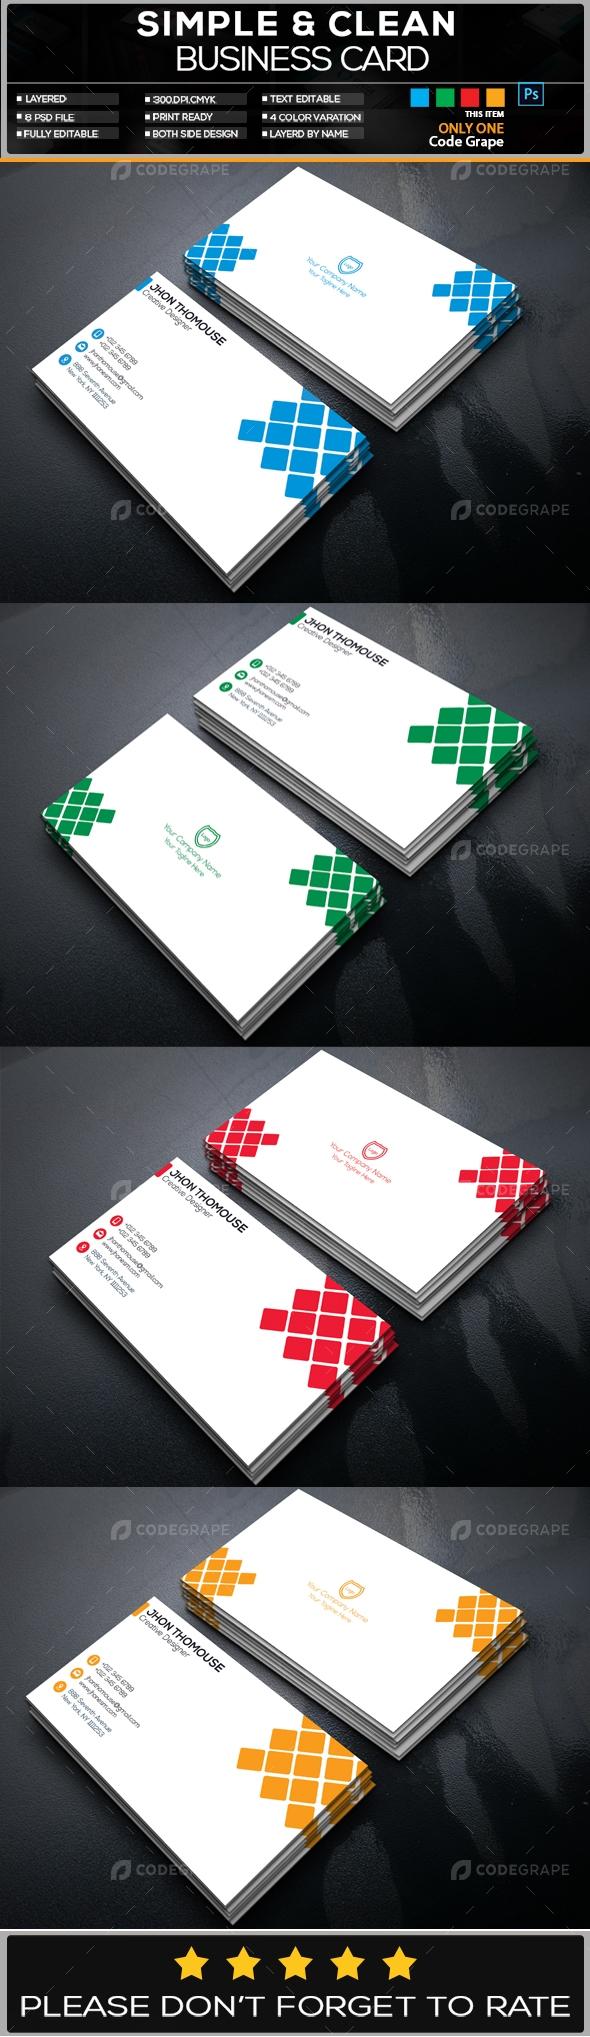 Creative Business Card Vol - 3